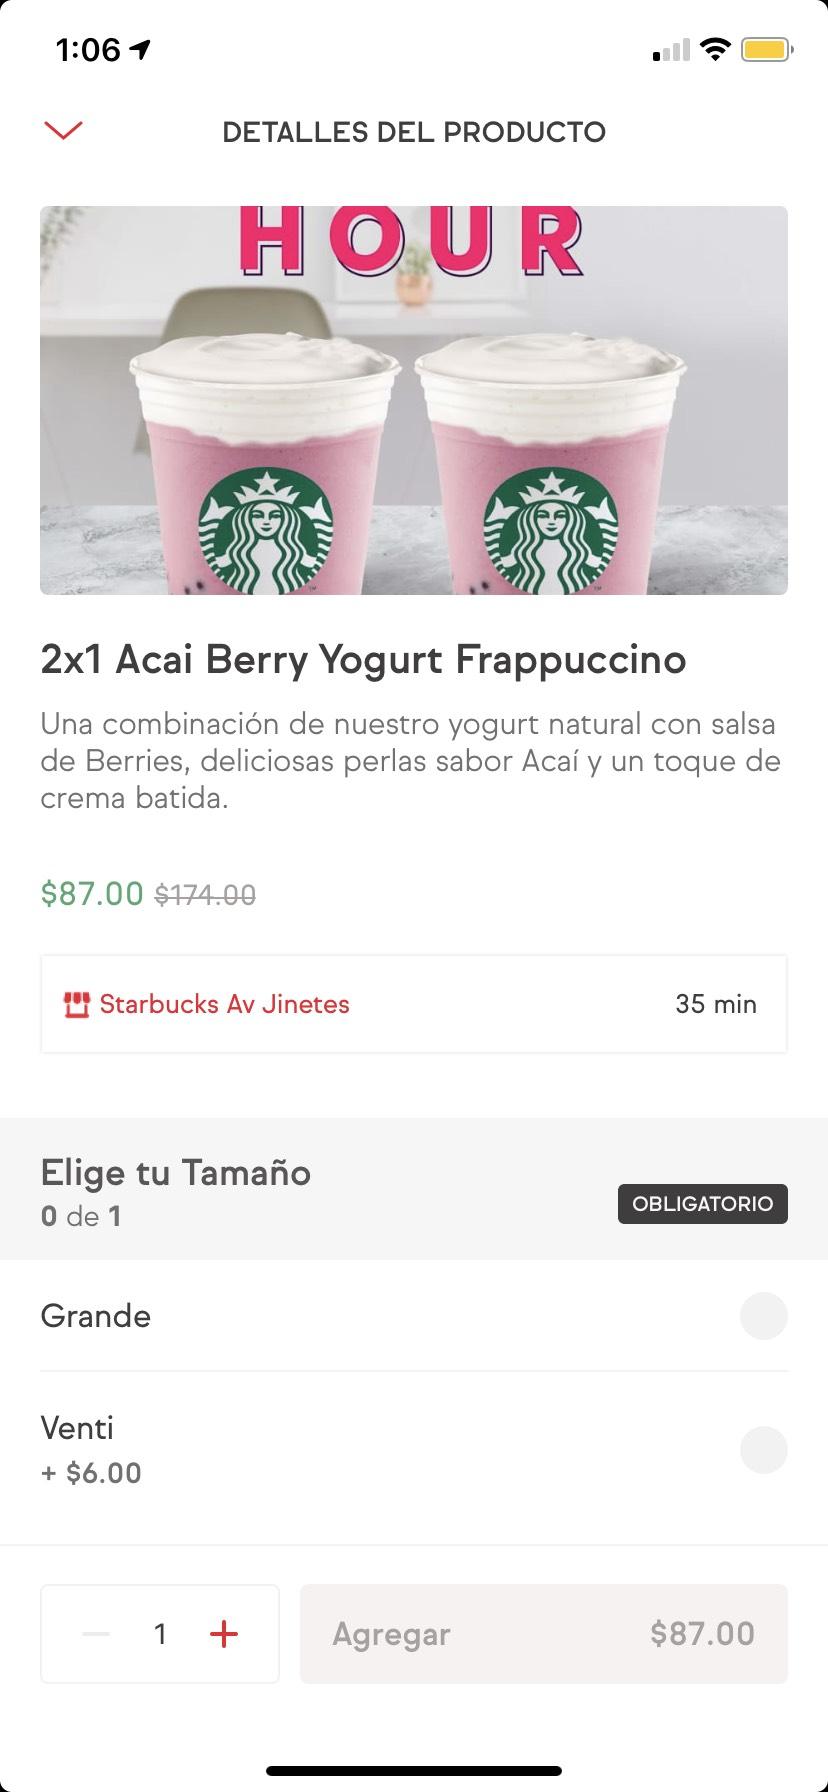 SinDelantal: 2x1 Acai berry yogurt Frappucino